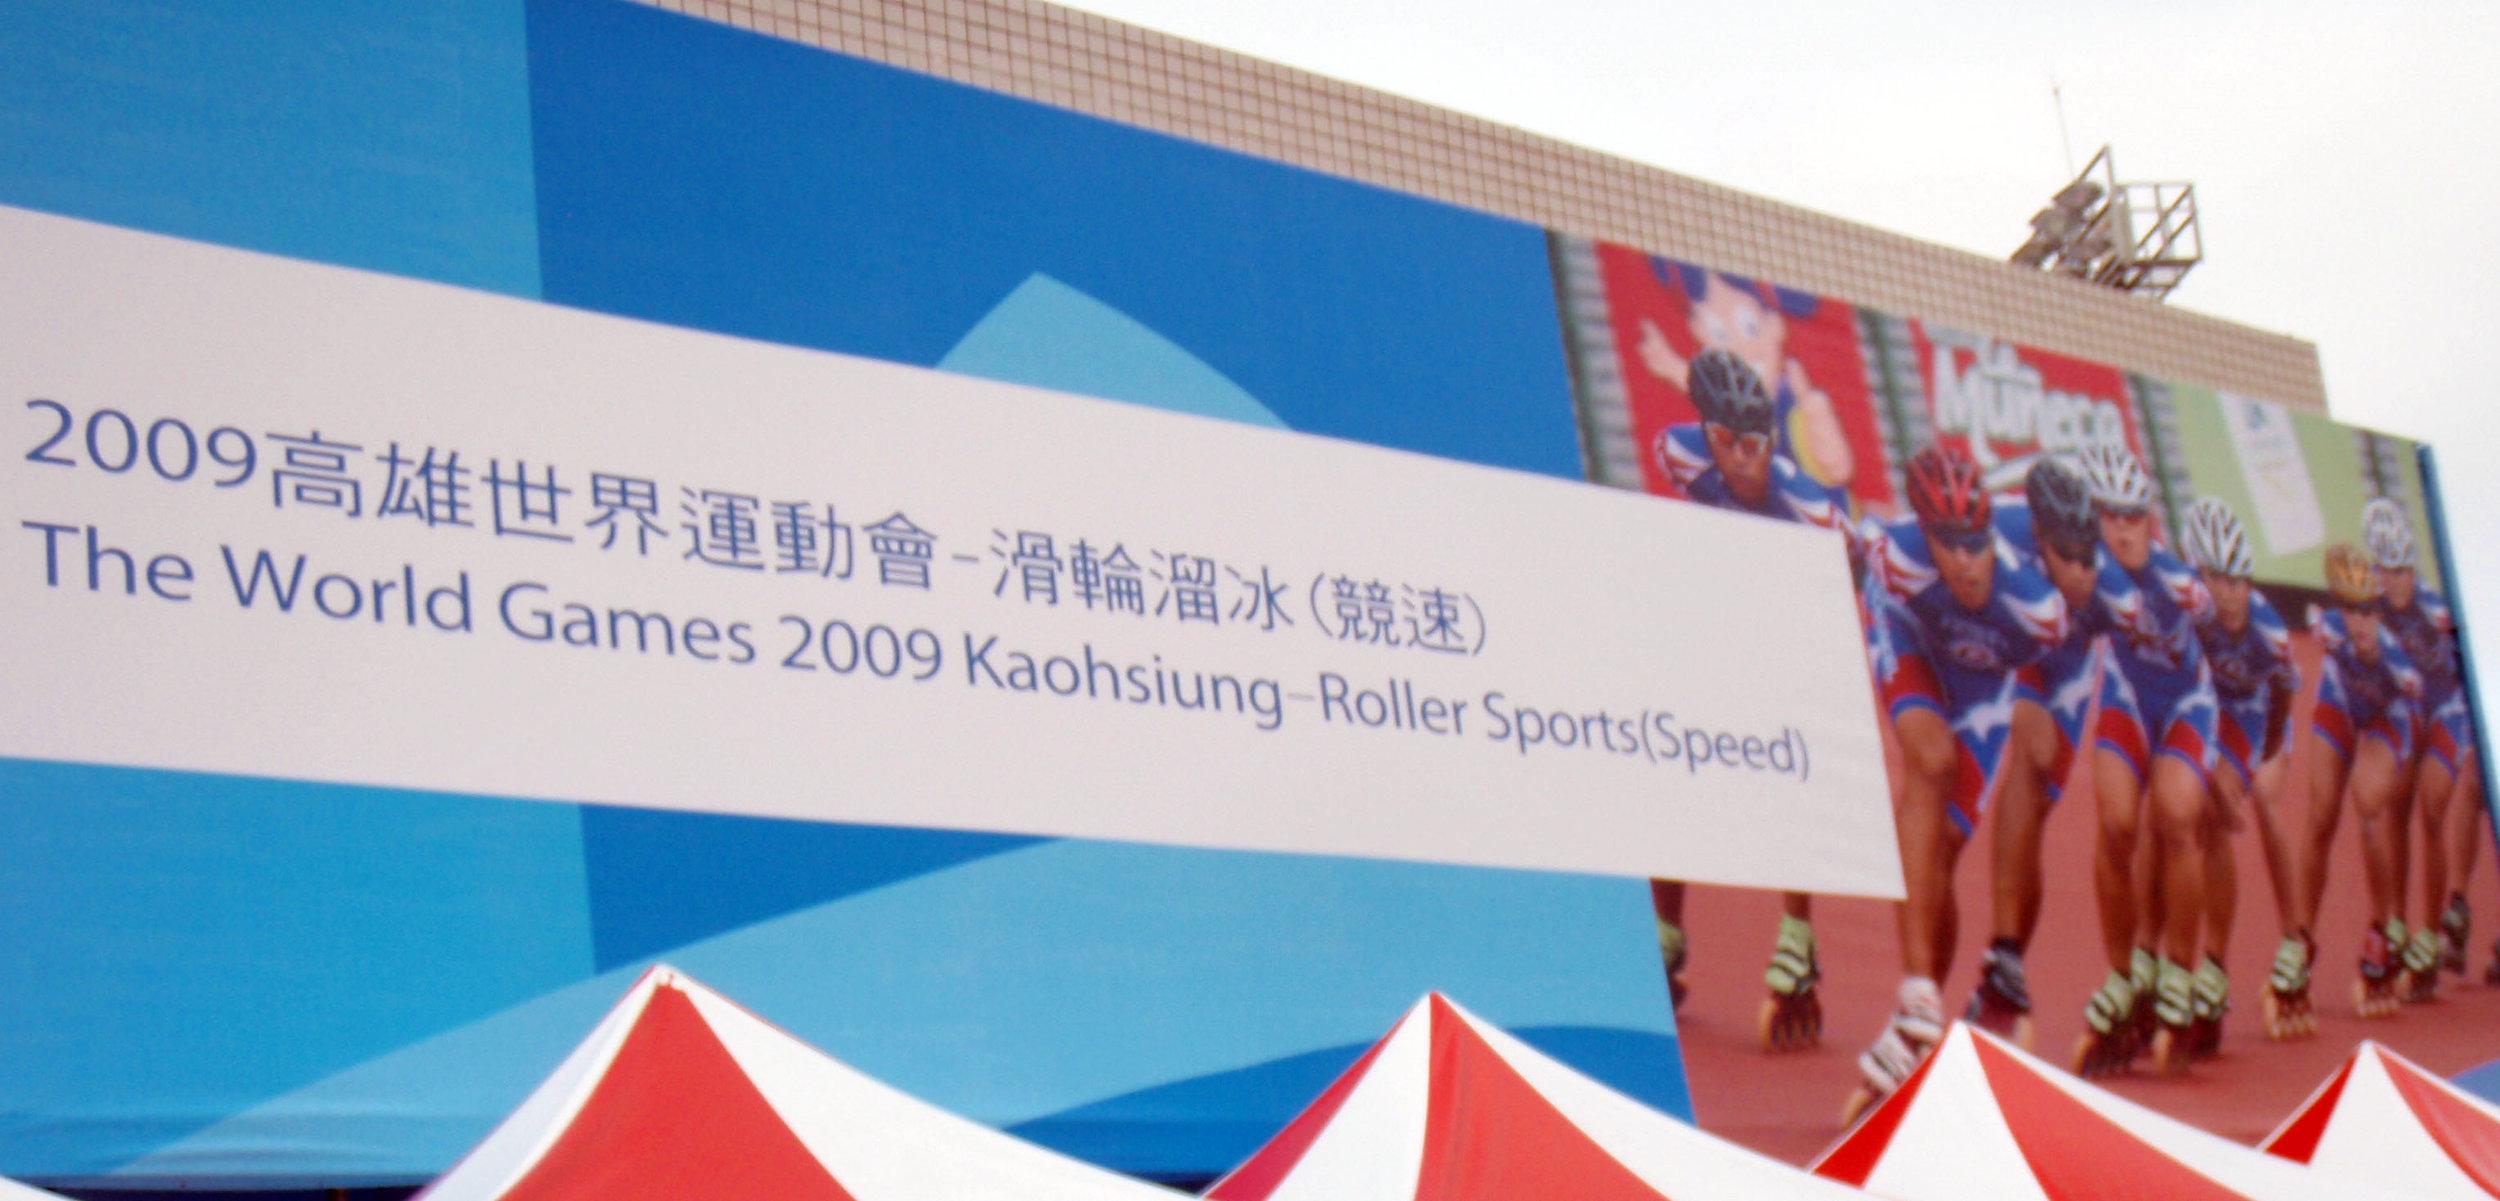 Kaohsiung world games.jpg